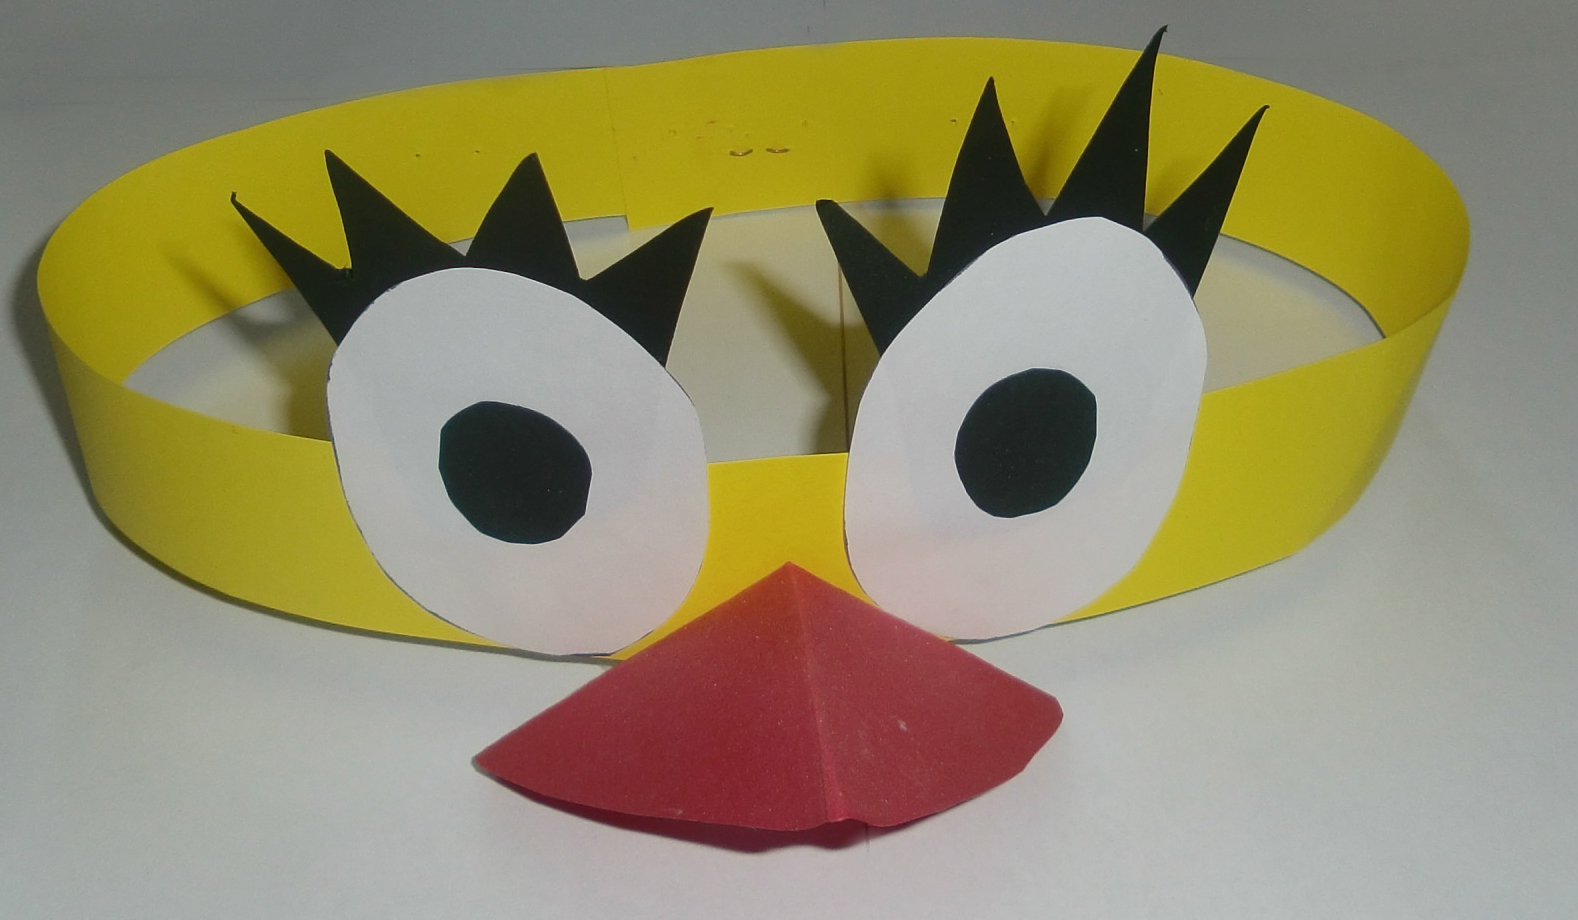 Corona de pato